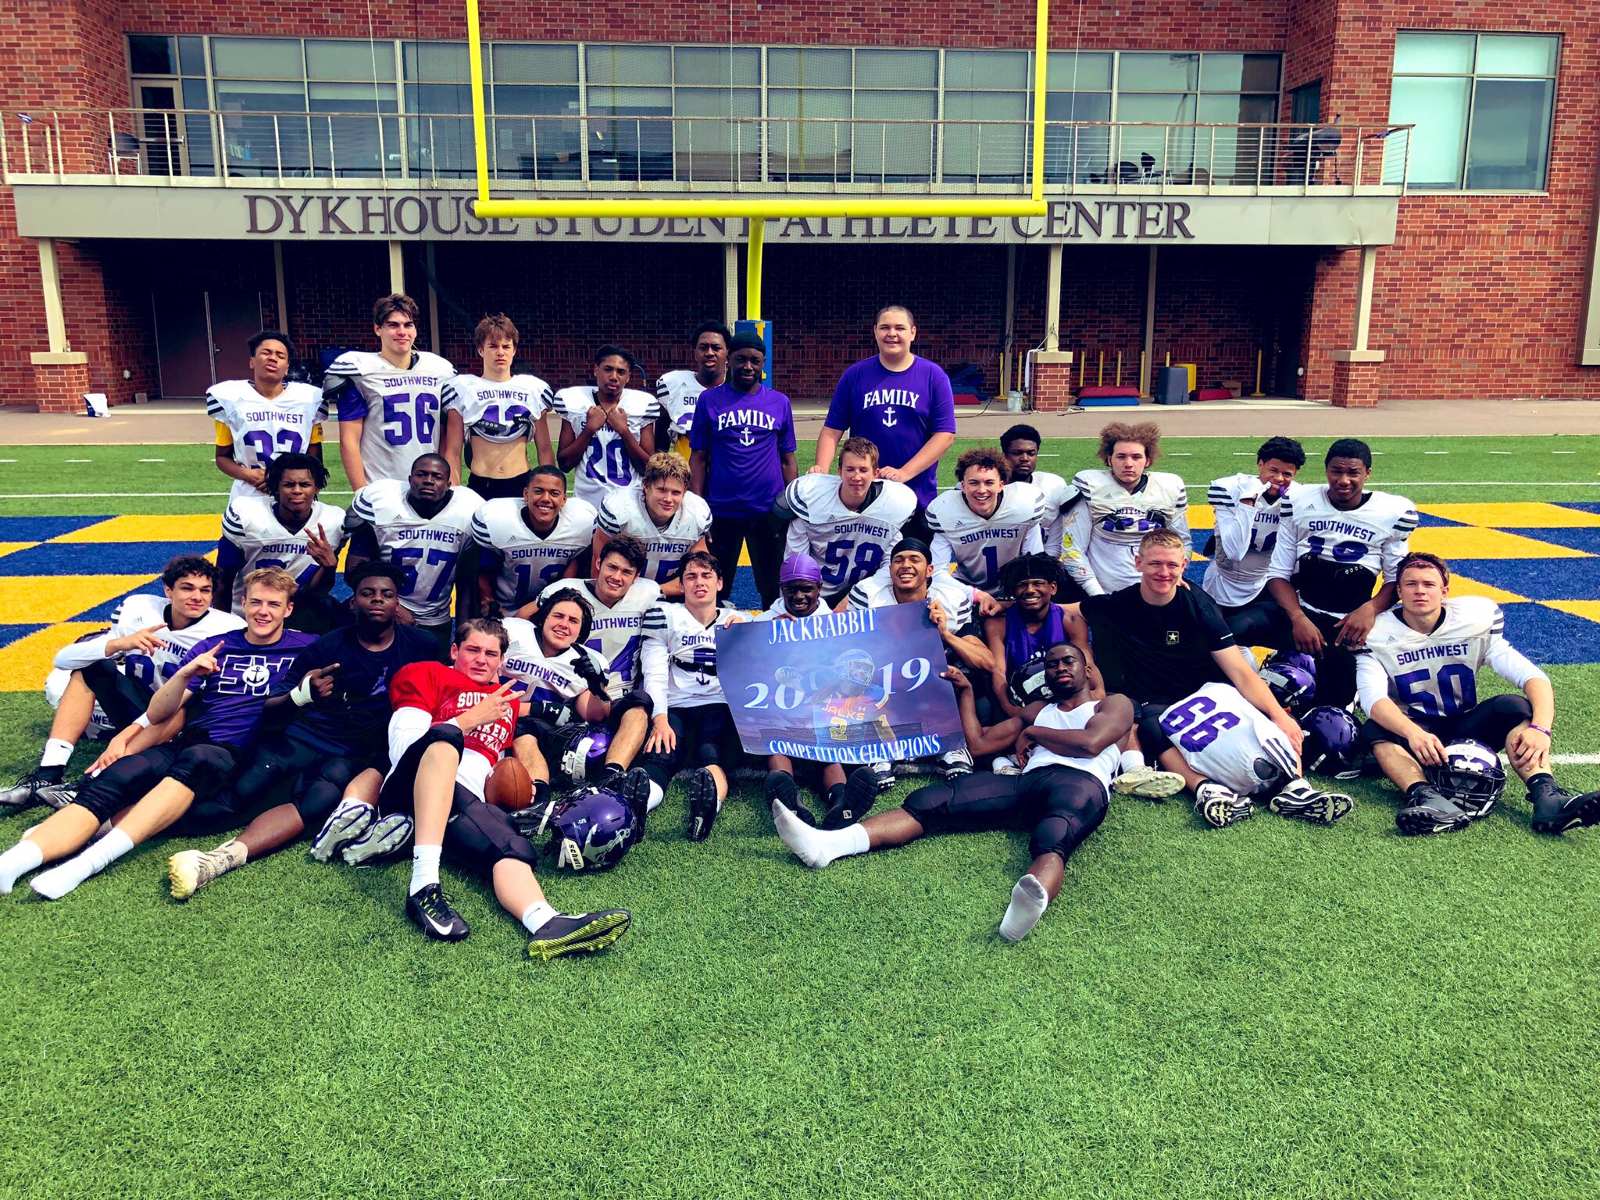 The Football Team Wins the SDSU Jackrabbit Championship